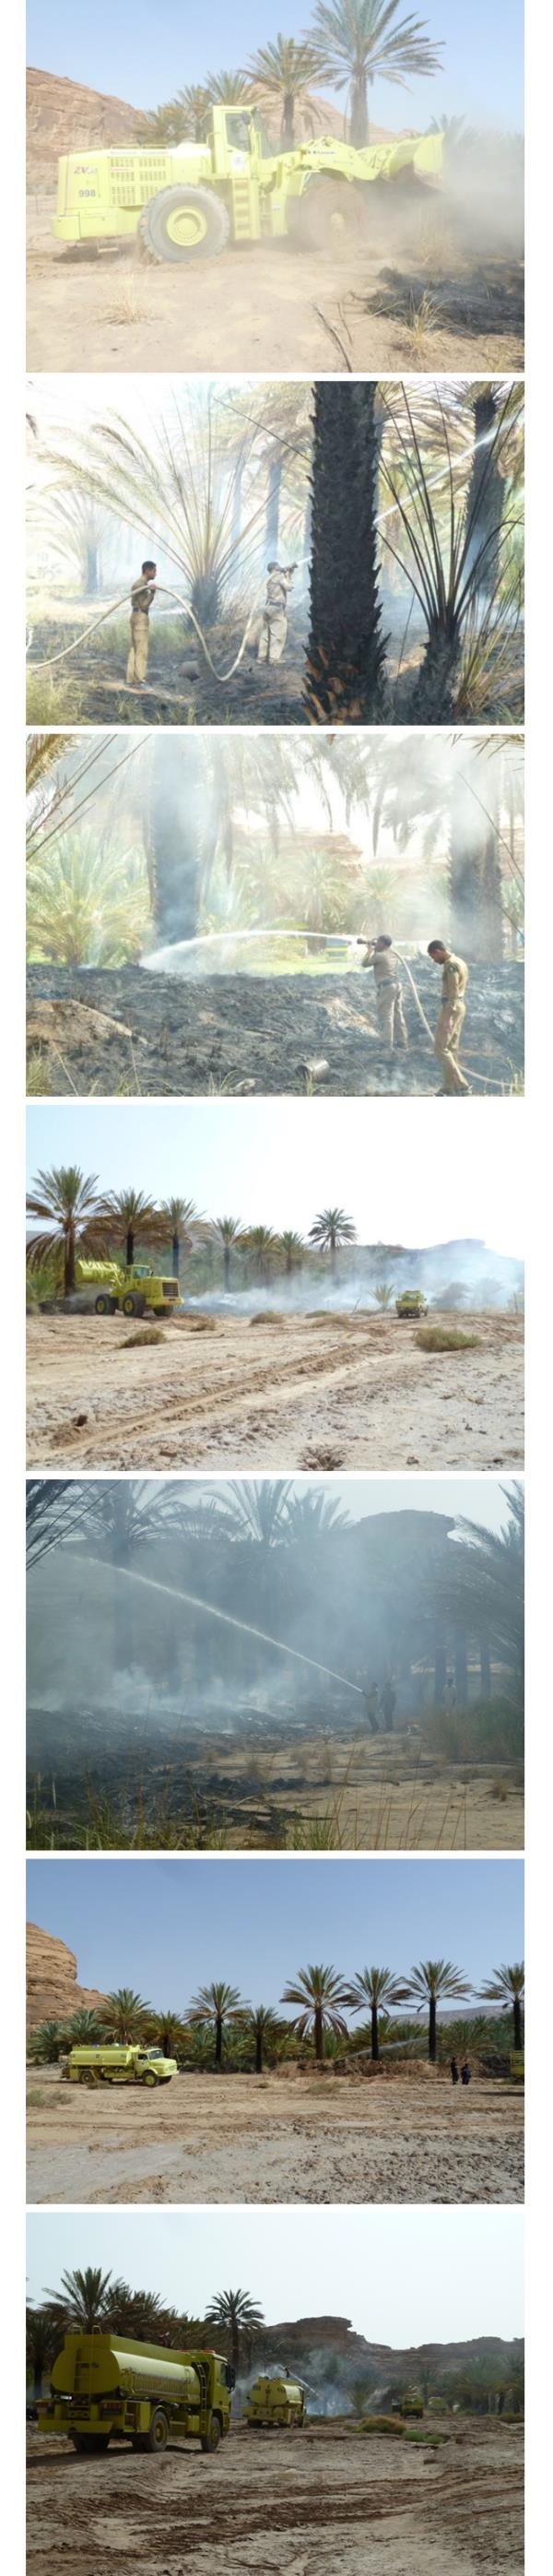 صور الحريق